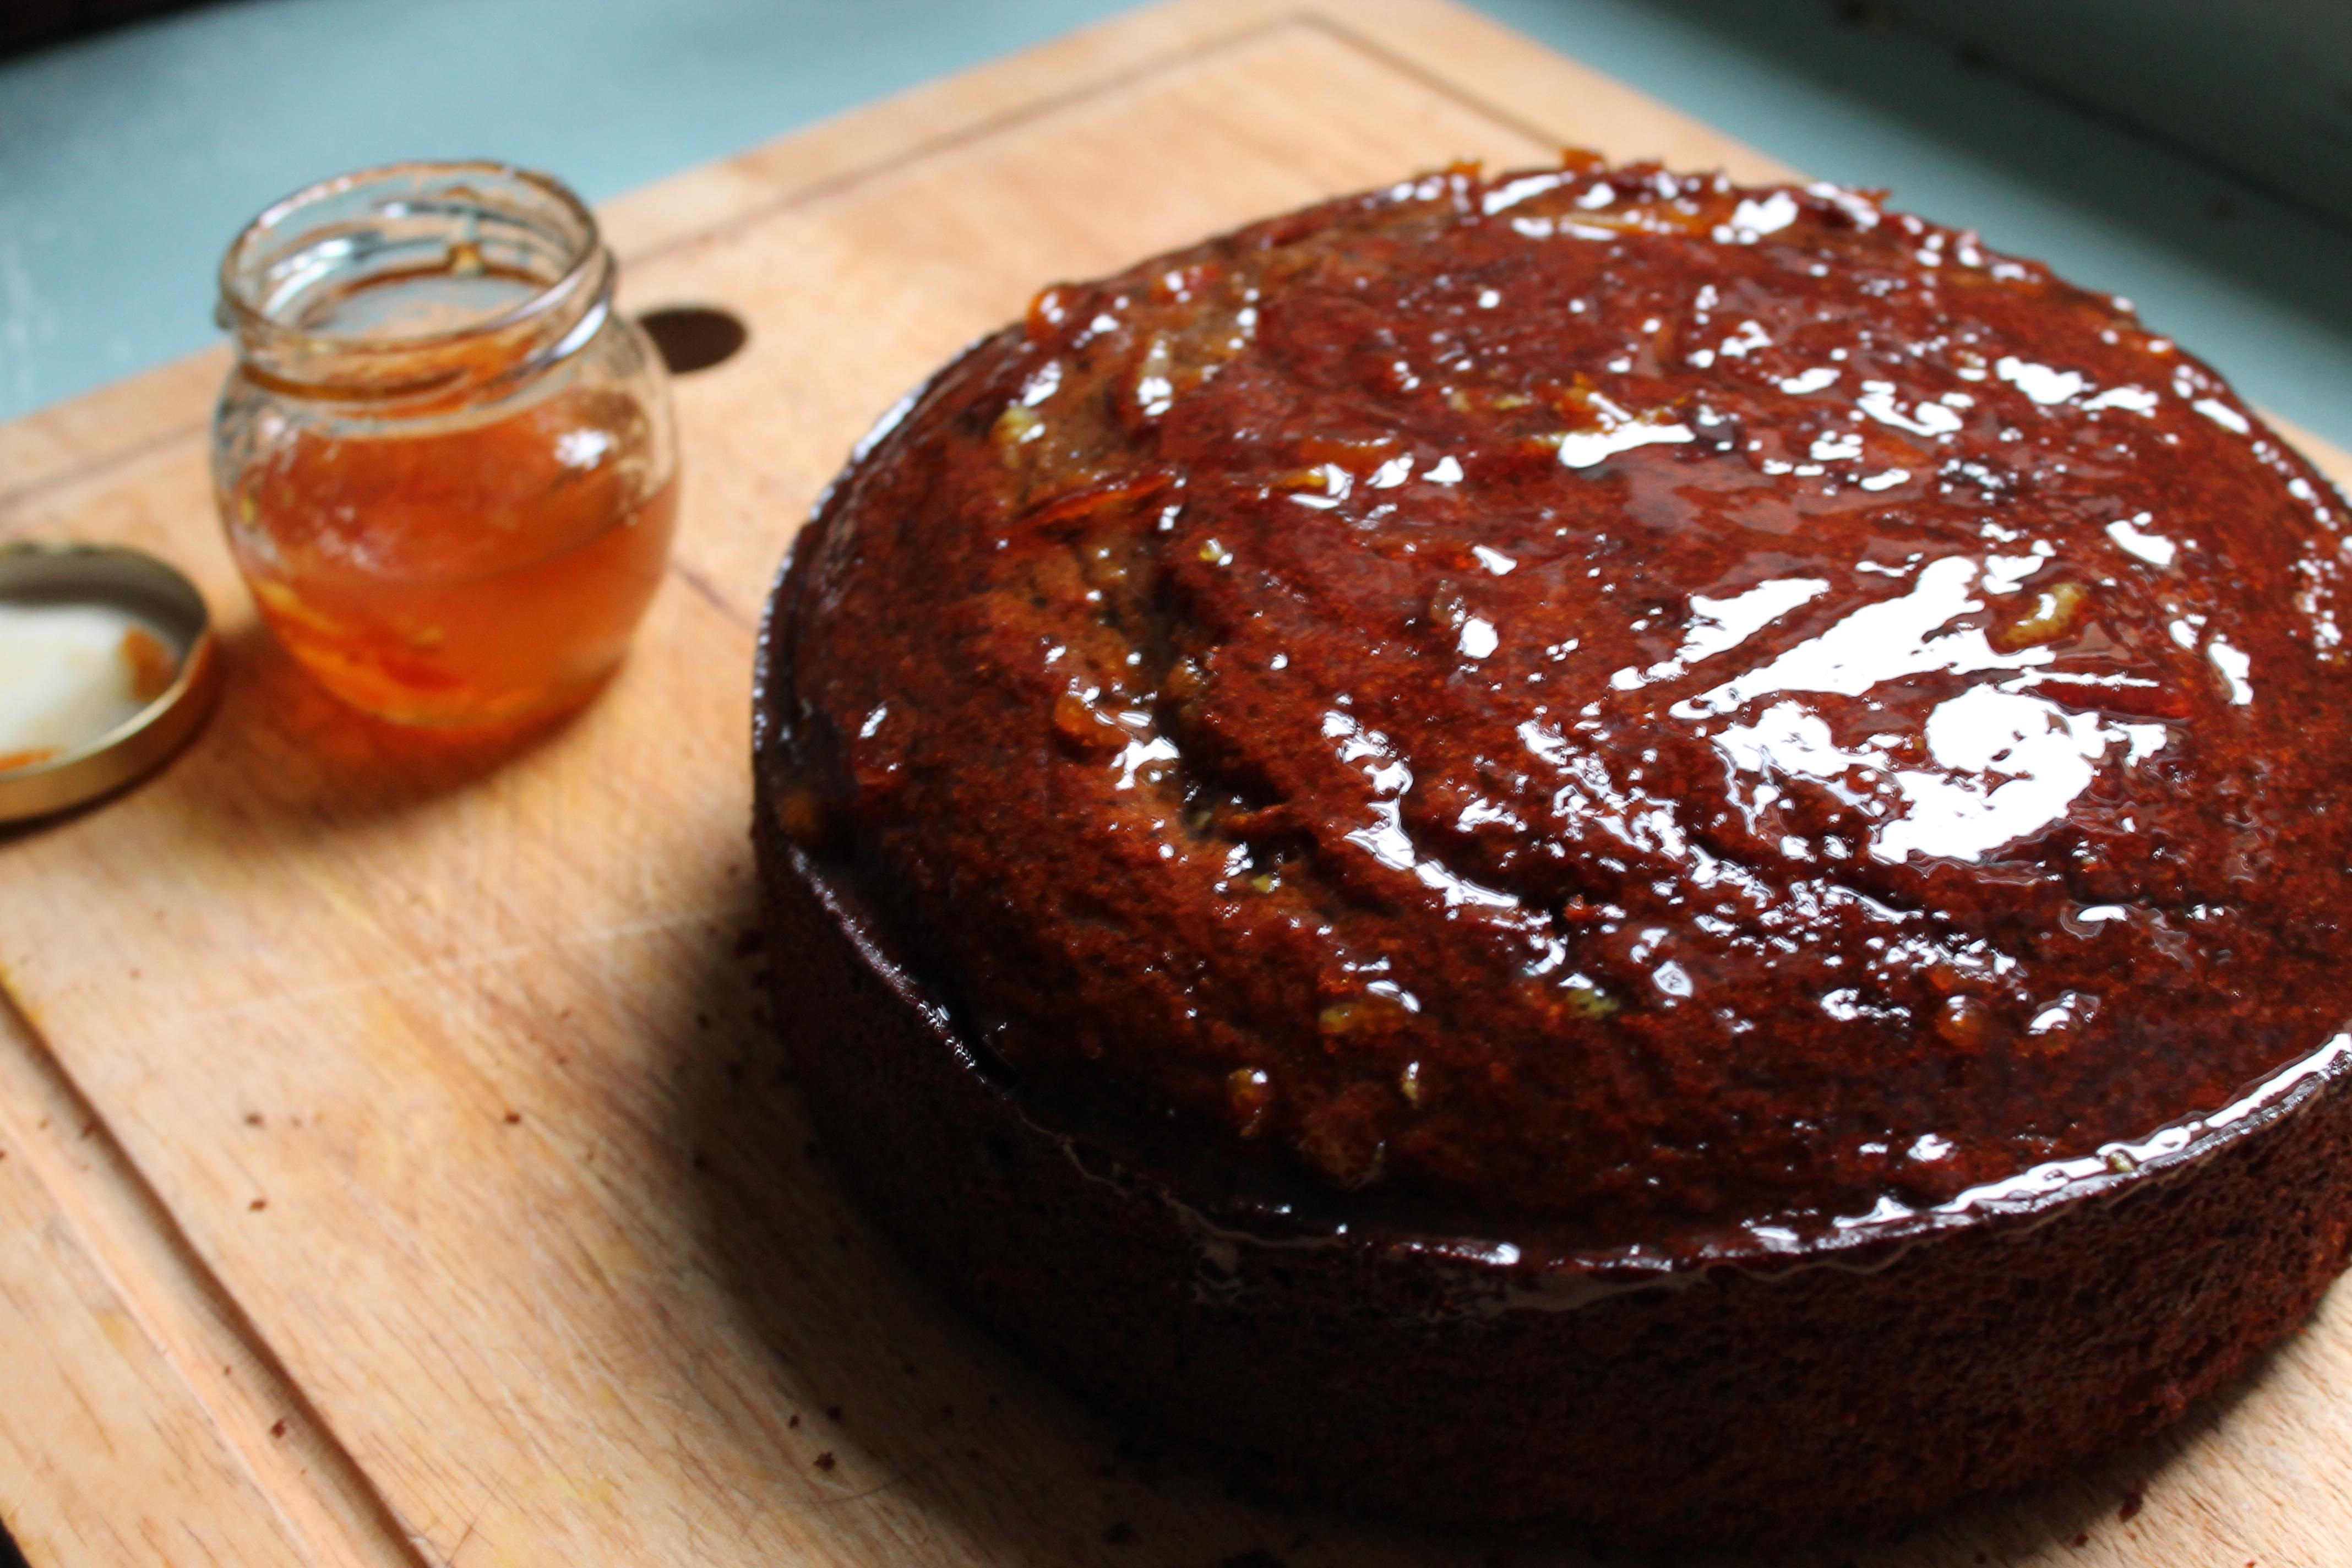 Date And Orange Cake With A Marmalade Glaze Sugar Chai Honey Bunch